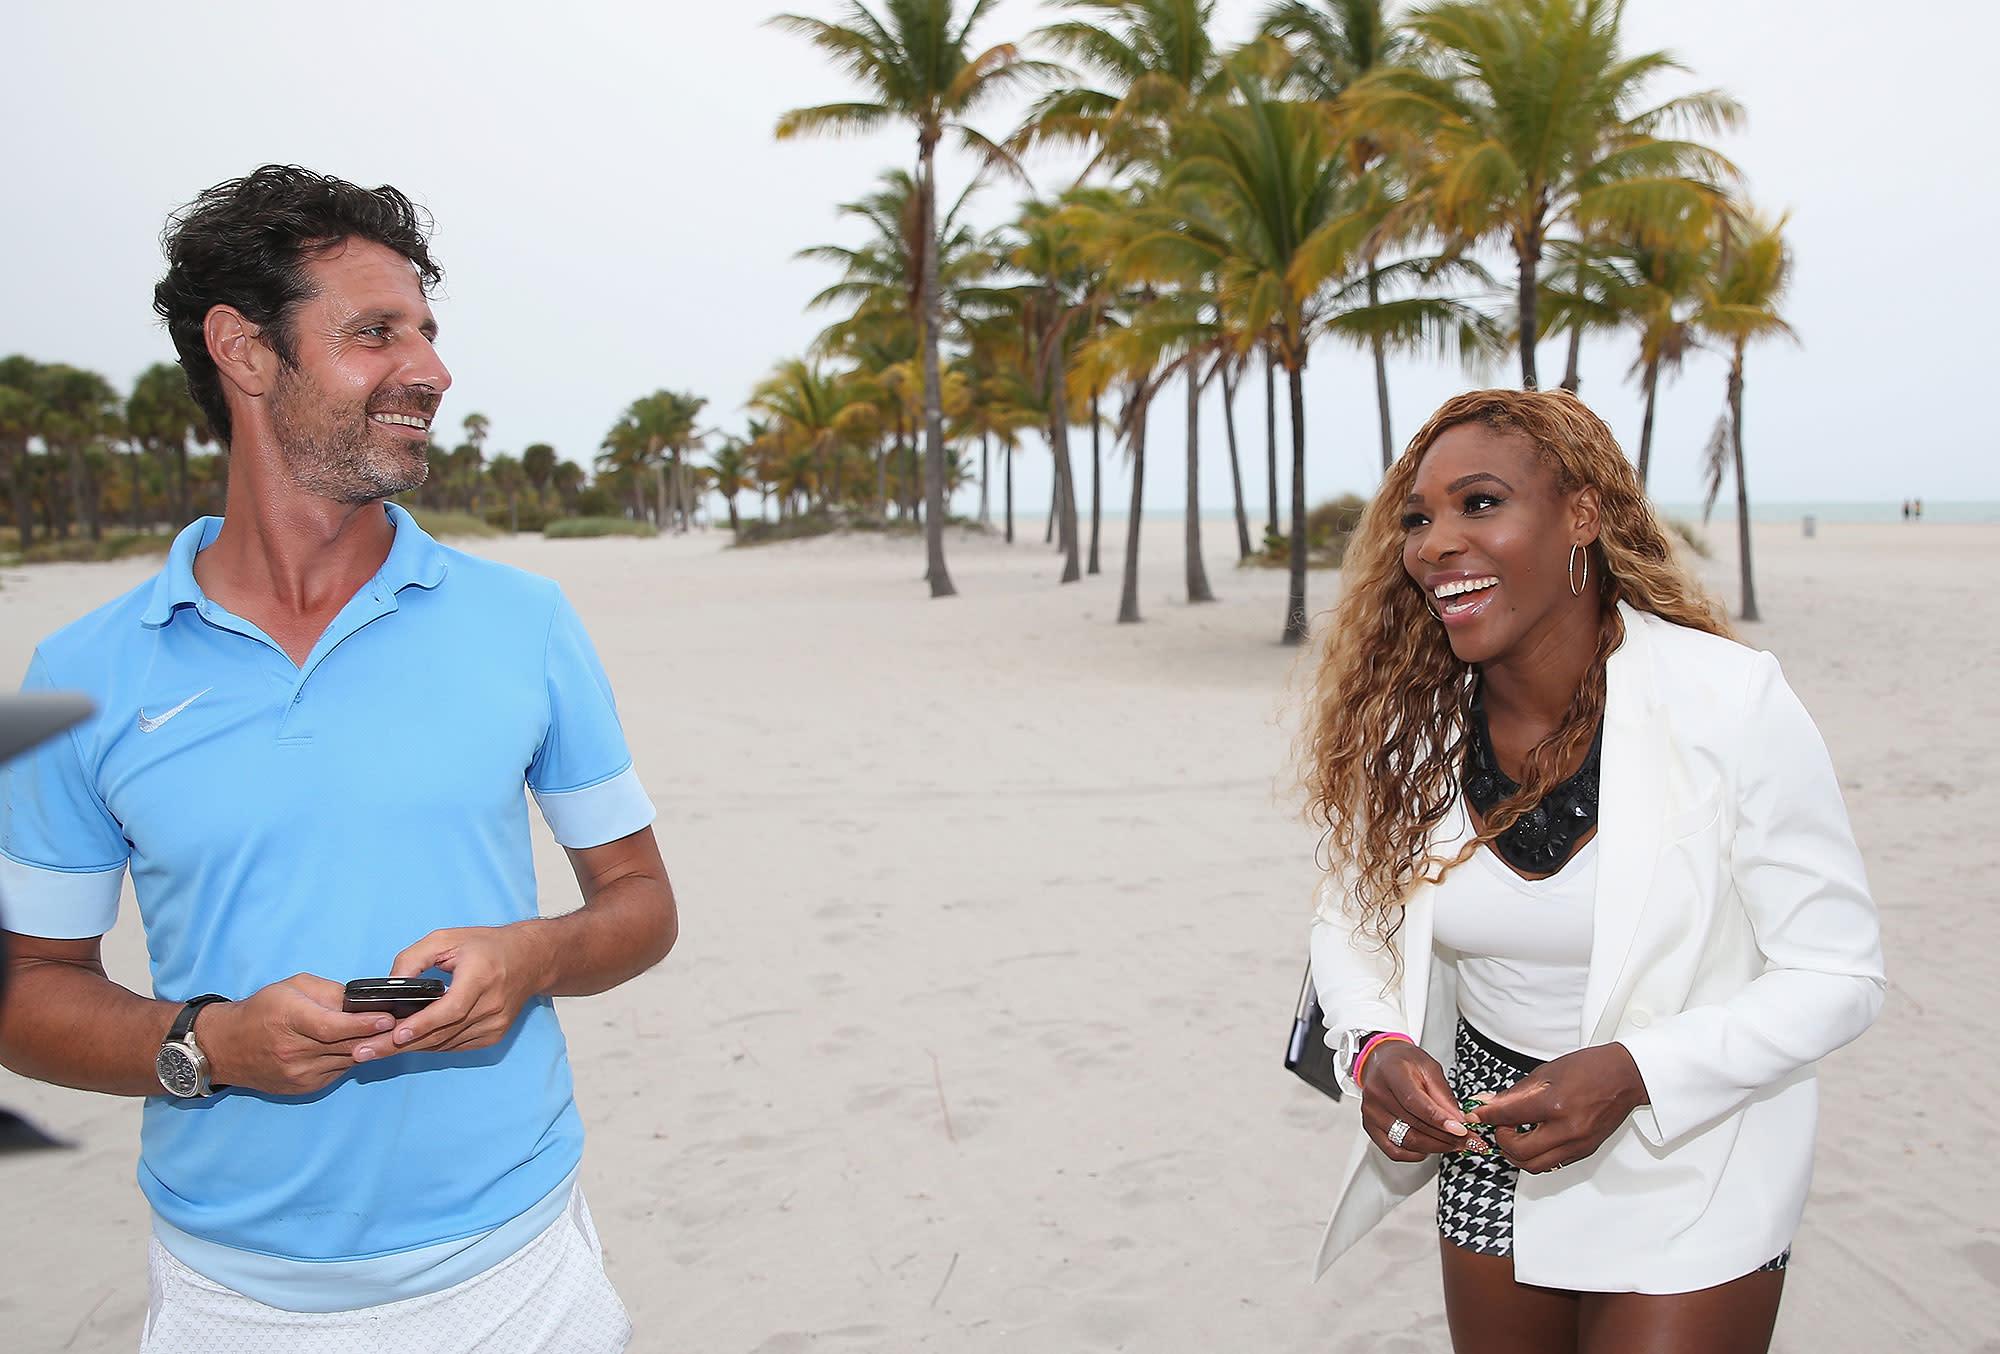 Serena Williams\u0027 Longtime Coach Sweetly Wishes Her a \u0027Very Happy ...